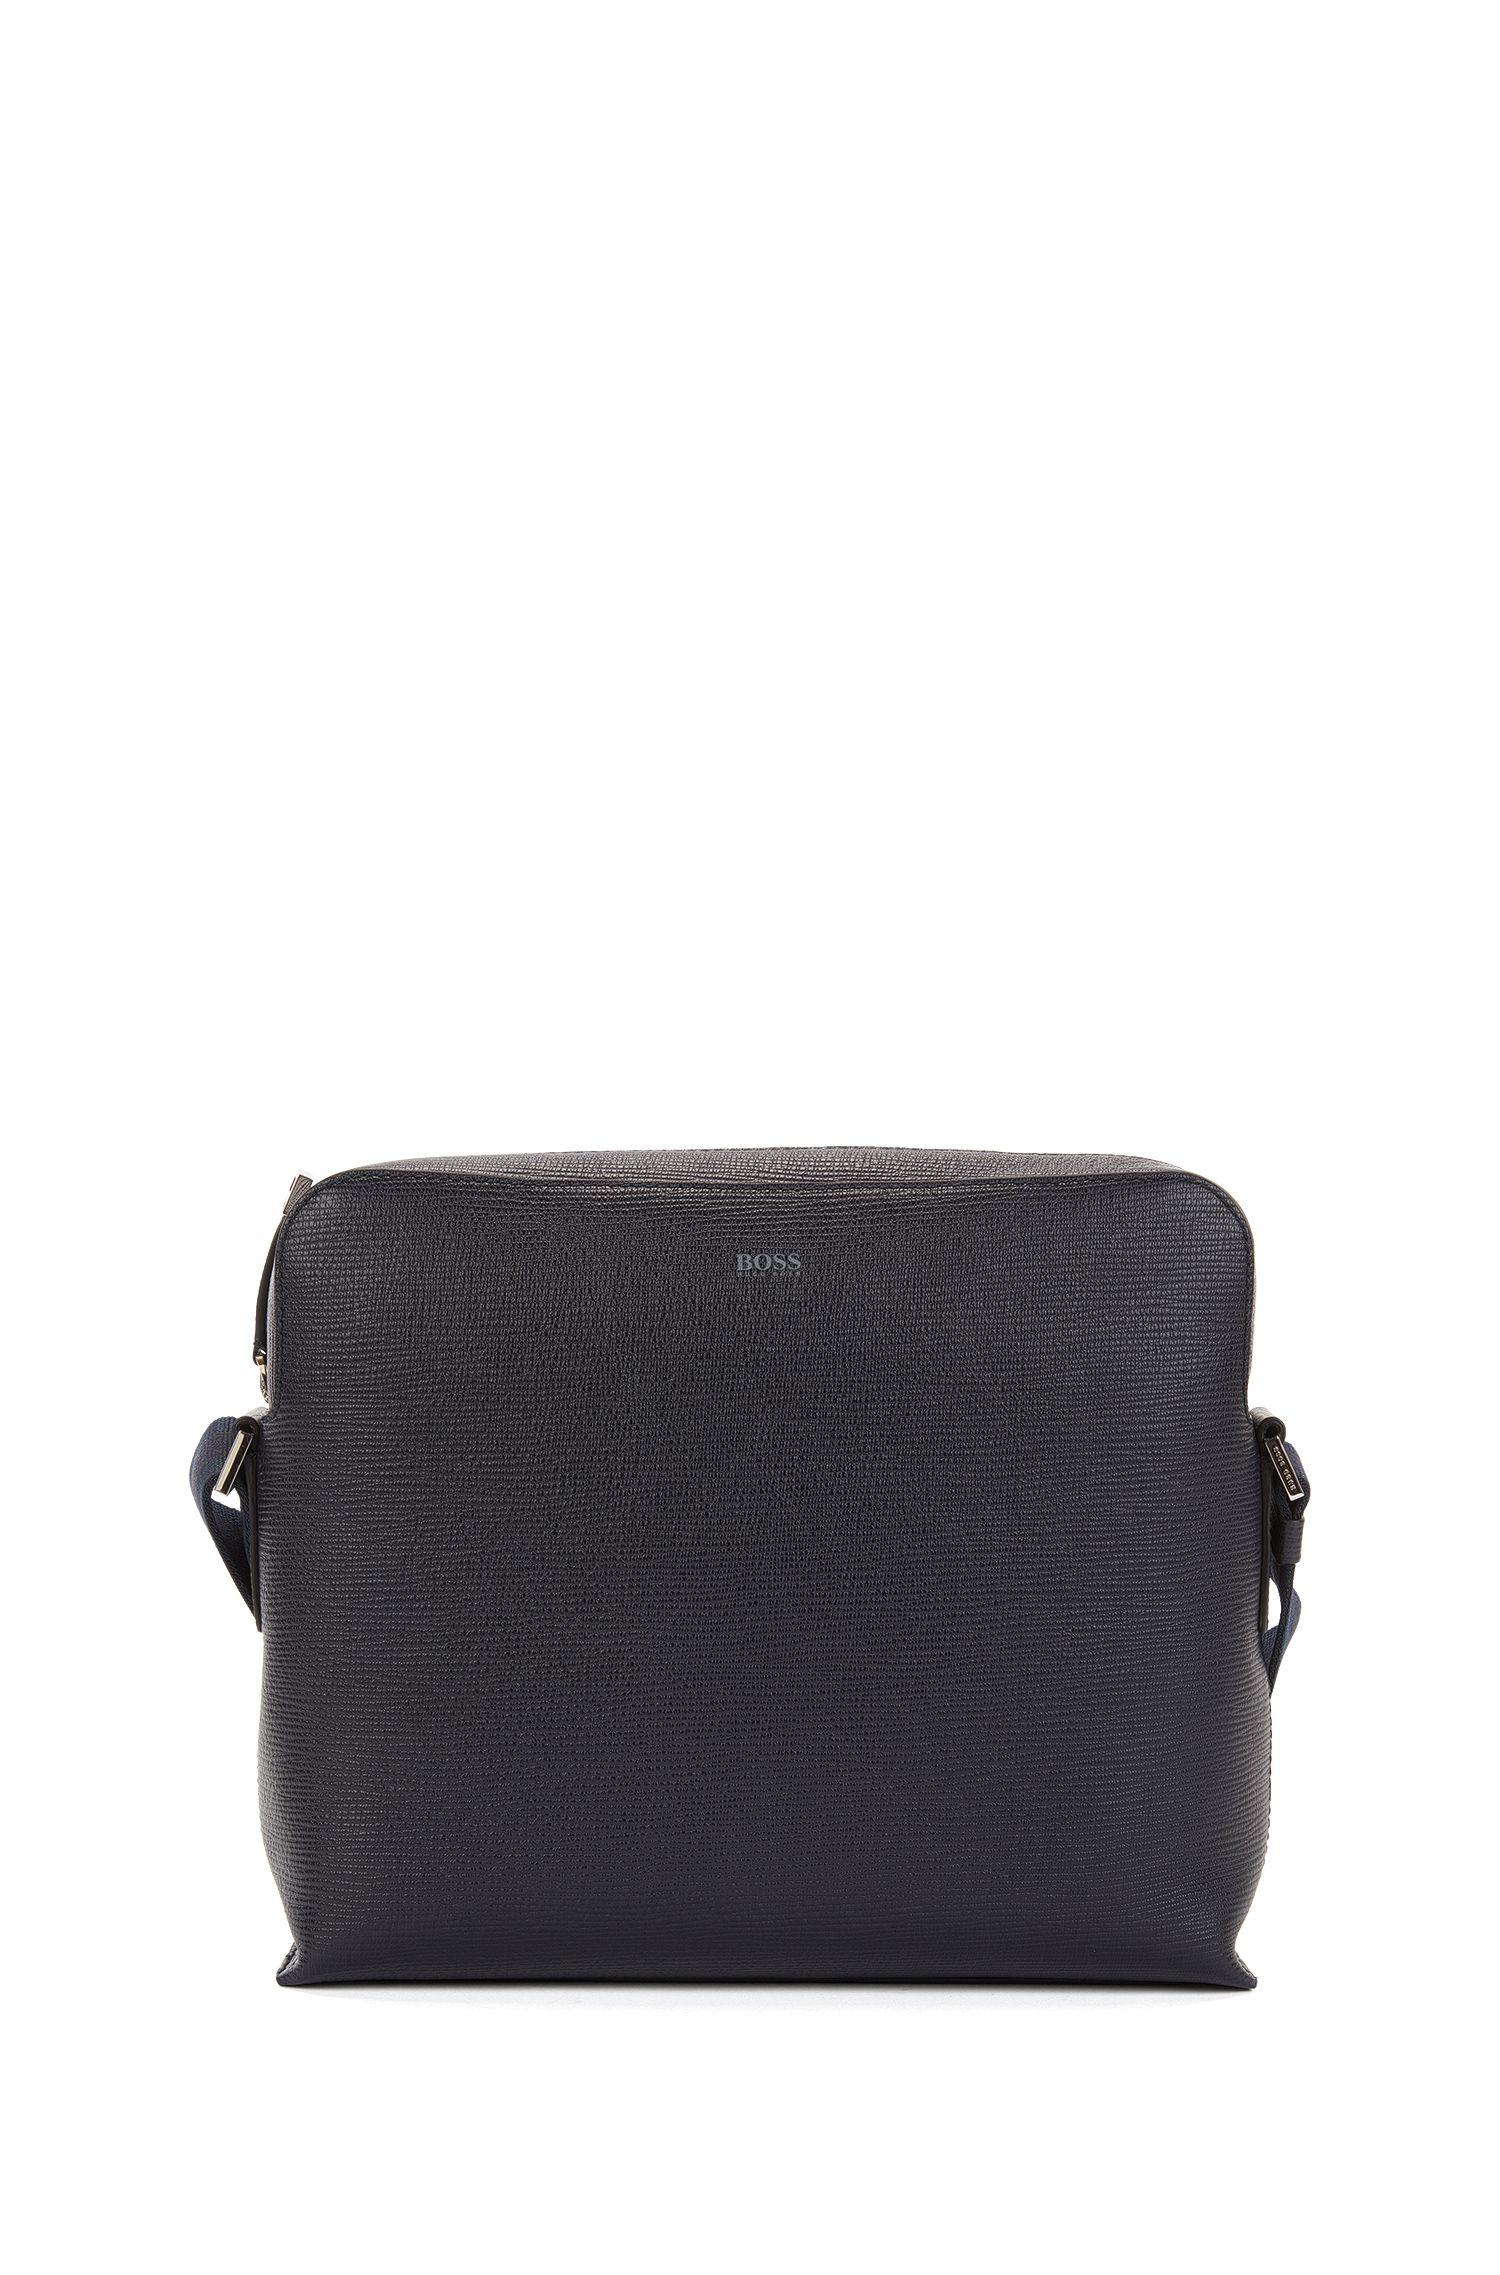 Leather Messenger Bag | Timeless Messenger